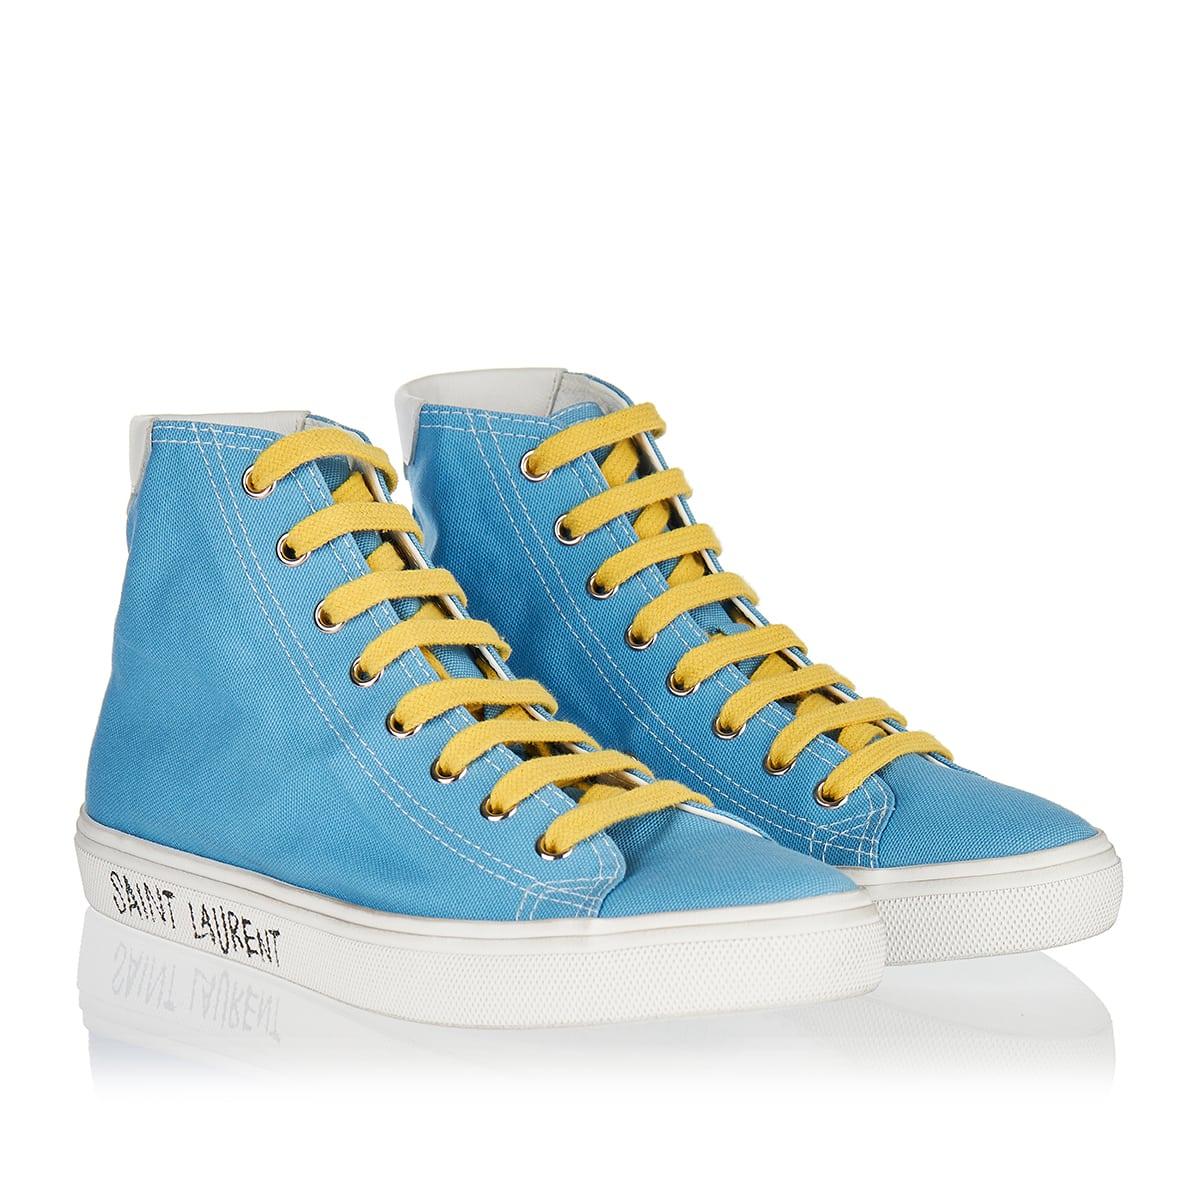 Malibu high-top canvas sneakers